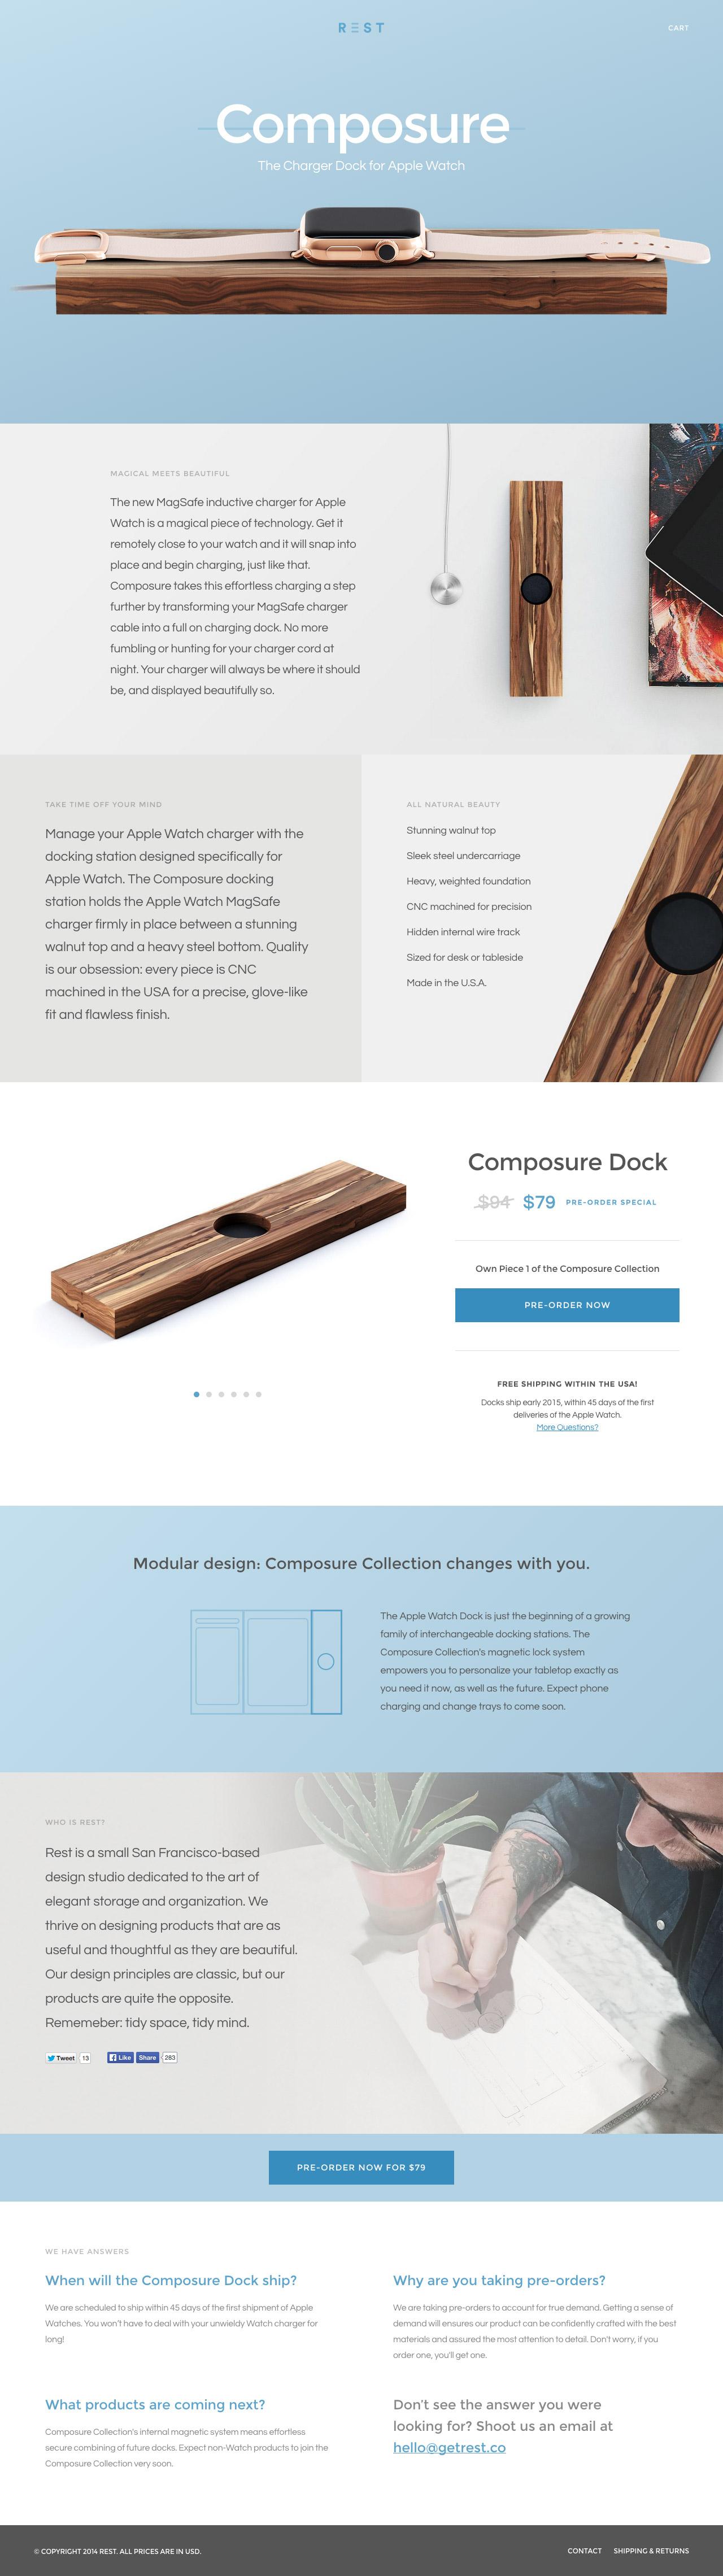 Composure Dock by Rest Website Screenshot